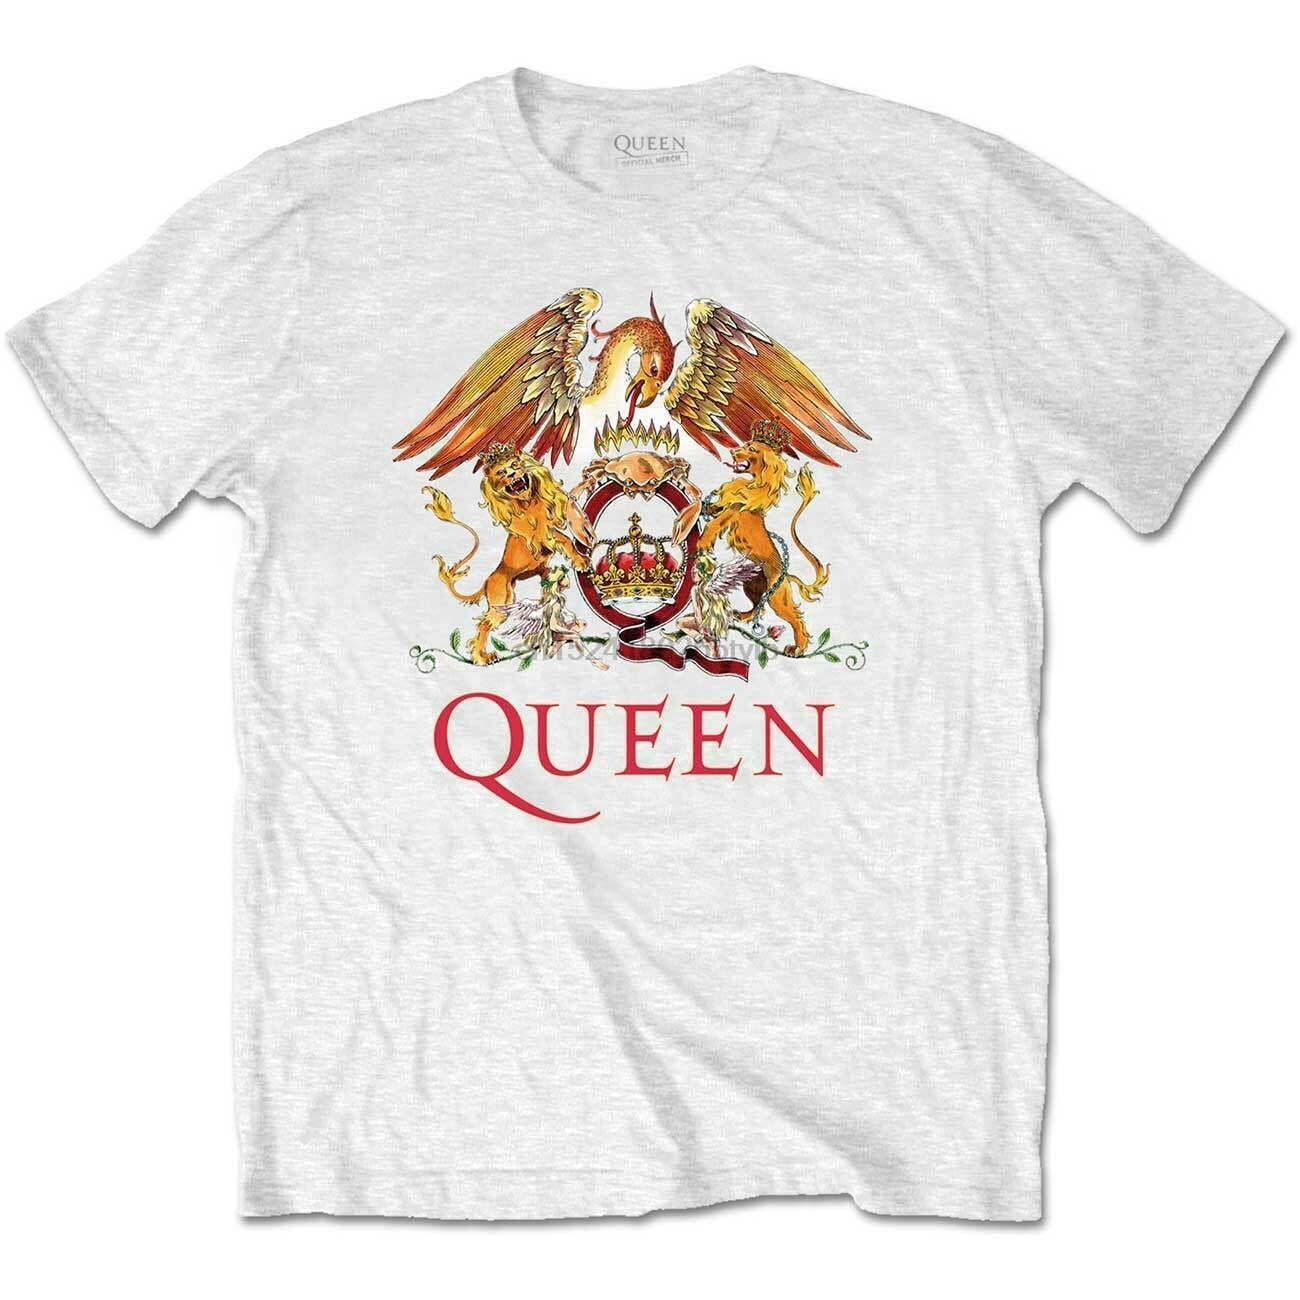 Crest white queen freddie mercury brian may official t-shirt men unisex